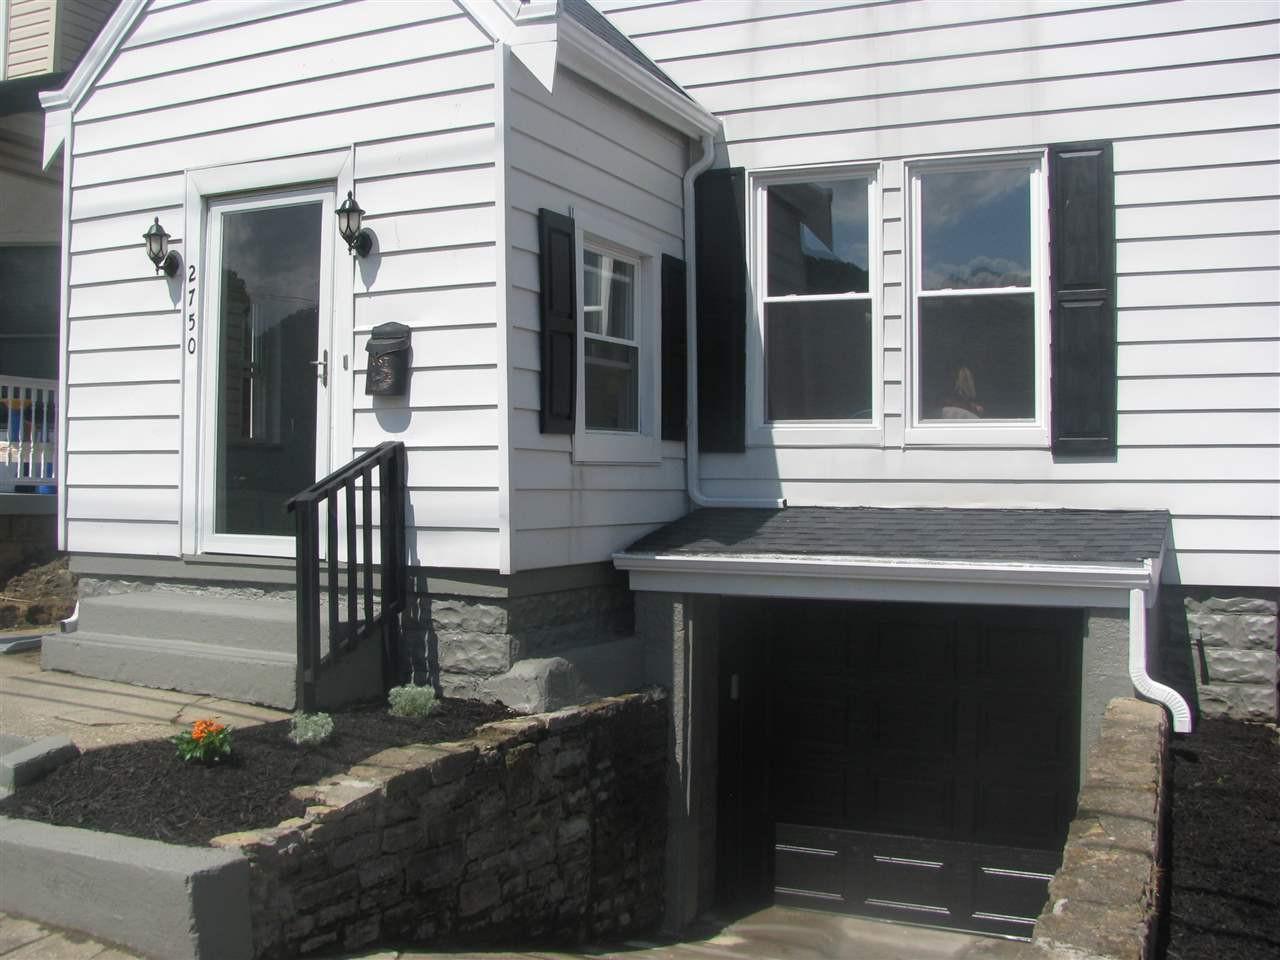 Photo 2 for 2750 Latonia Ave Covington, KY 41015